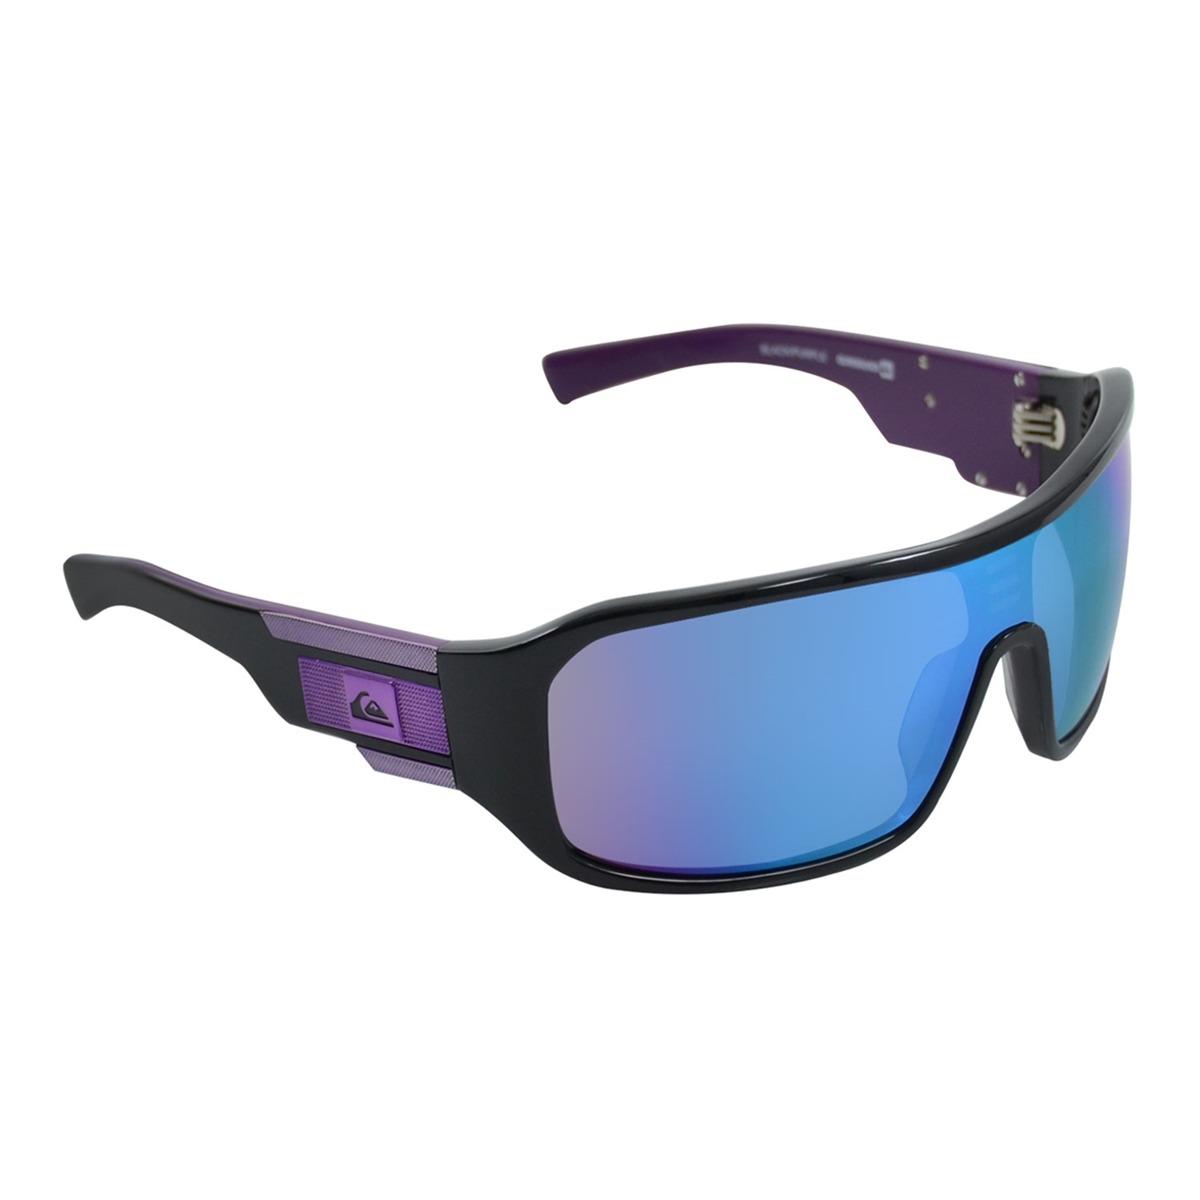 Óculos Masculino Quiksilver Racer Black Purple - R  169,90 em ... 346511f174